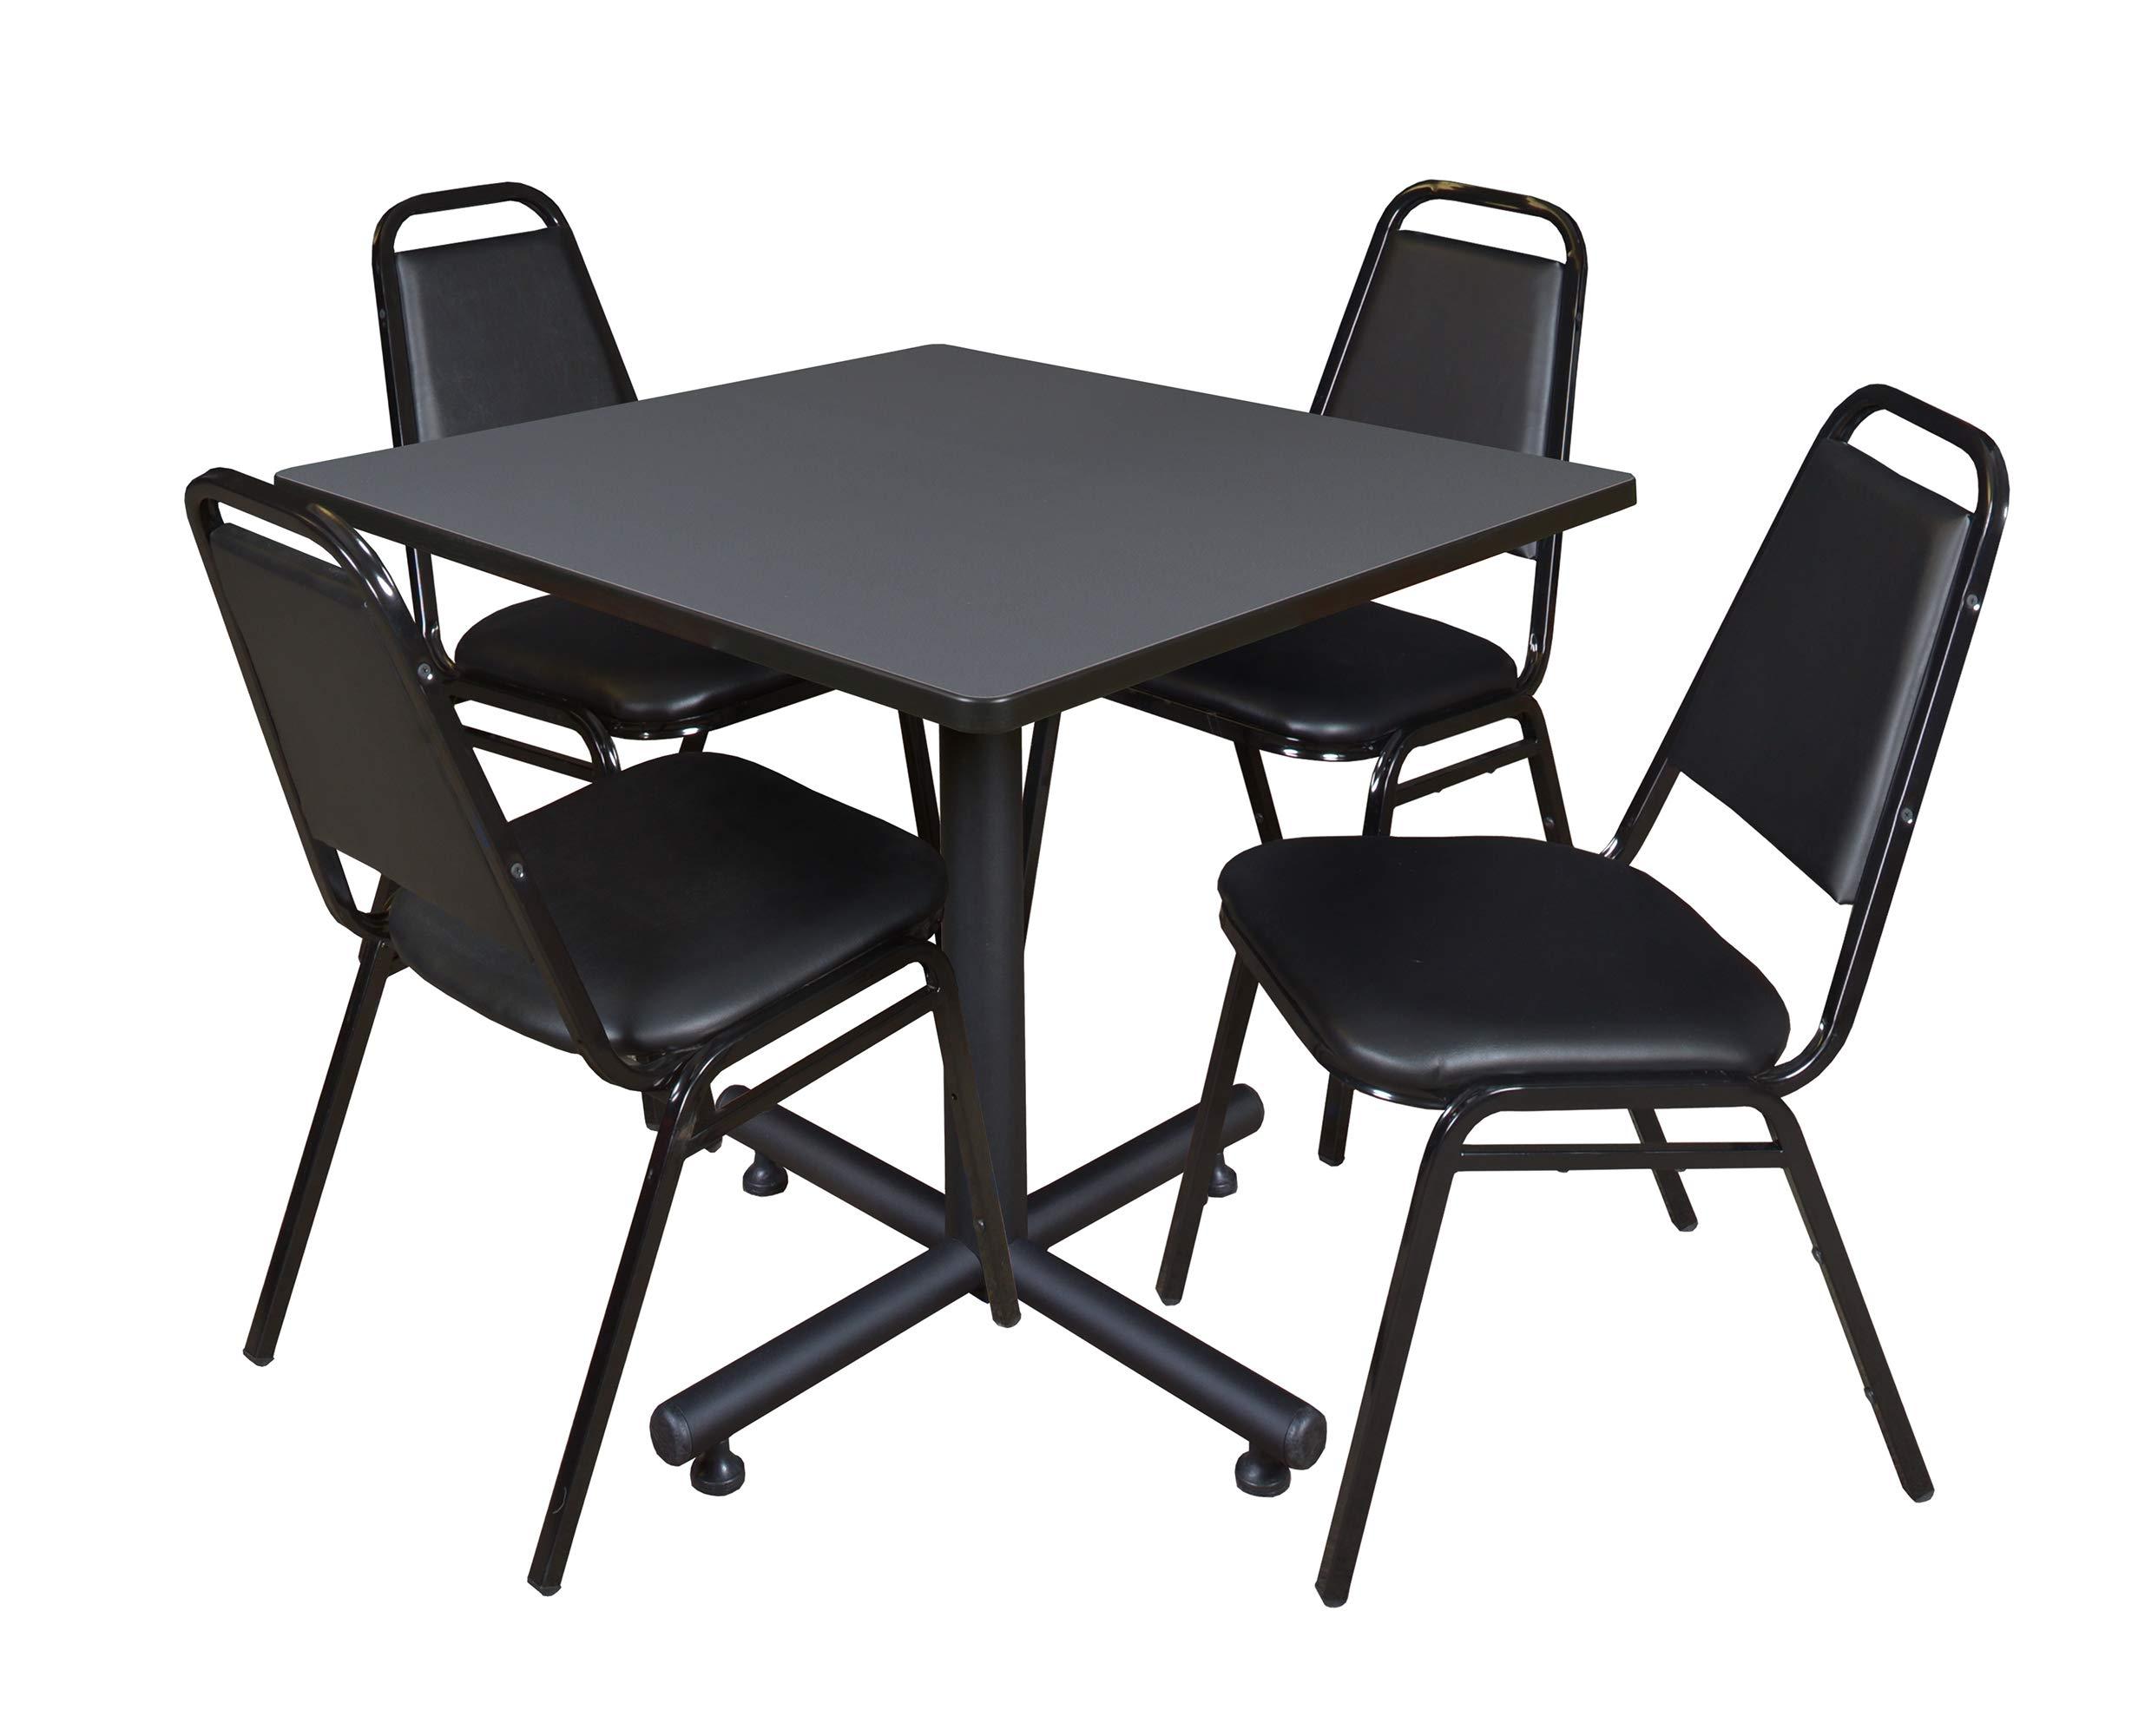 Regency Kobe 42-Inch Square Breakroom Table, Grey, and 4 Restaurant Stack Chairs, Black by Regency Seating